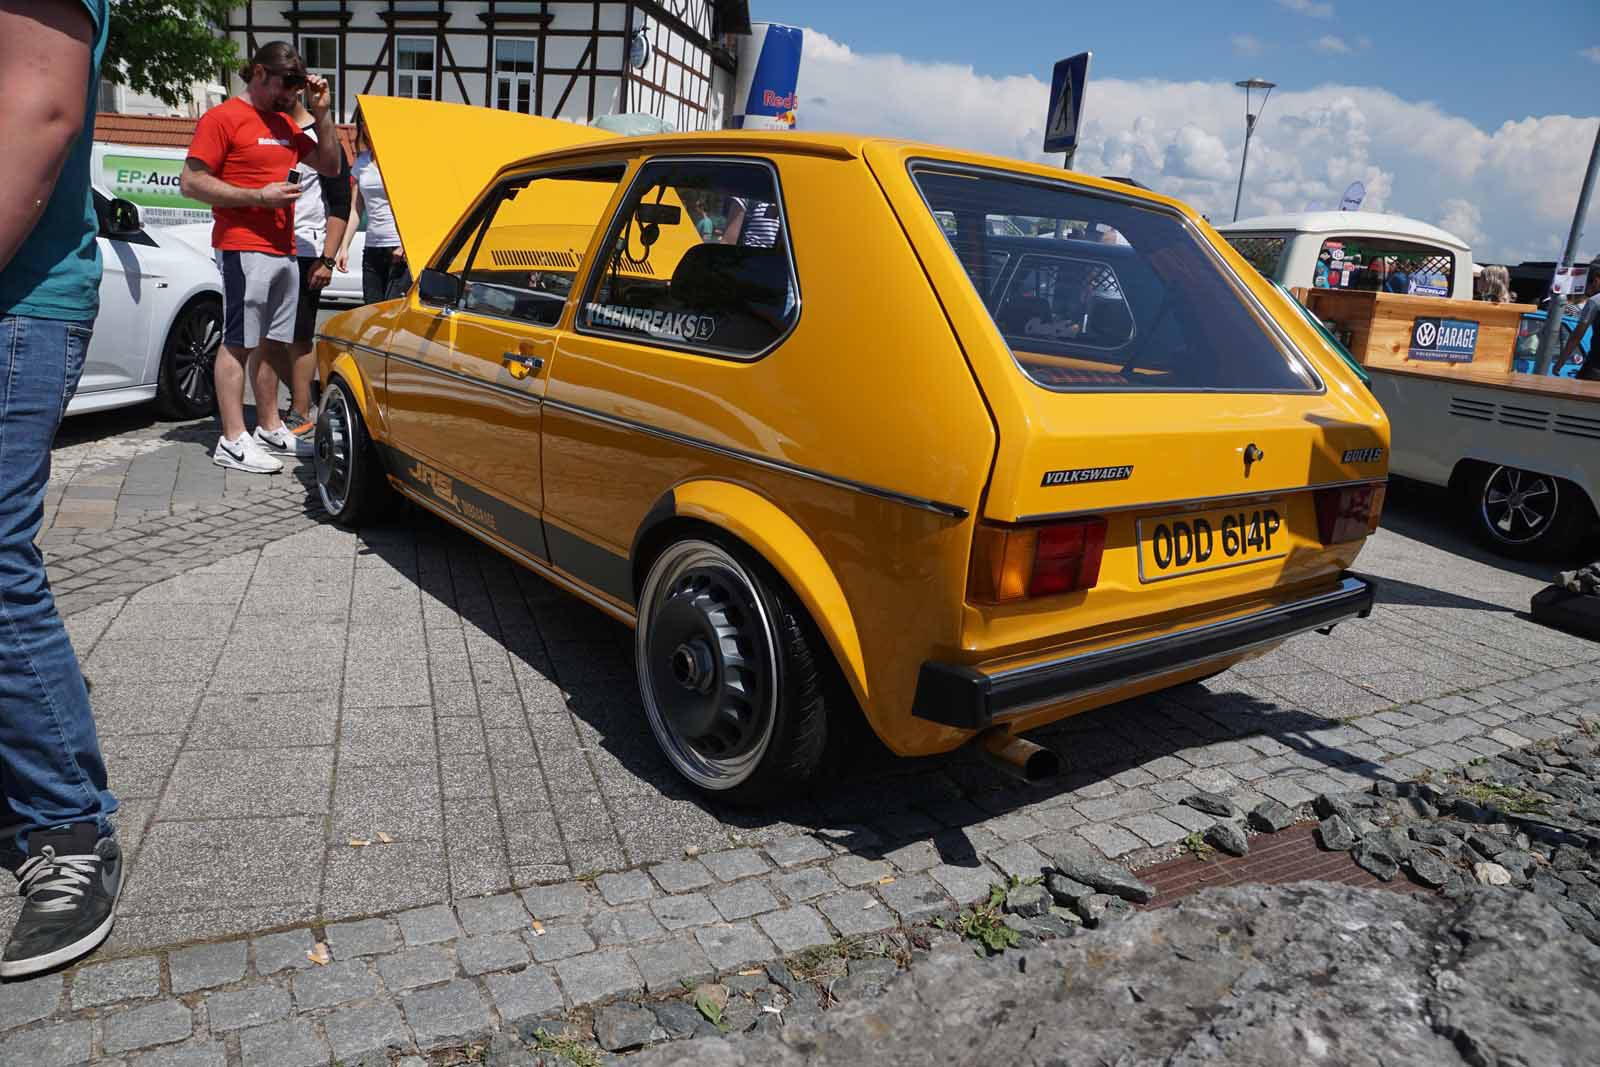 mtm brake3 600x300 photo